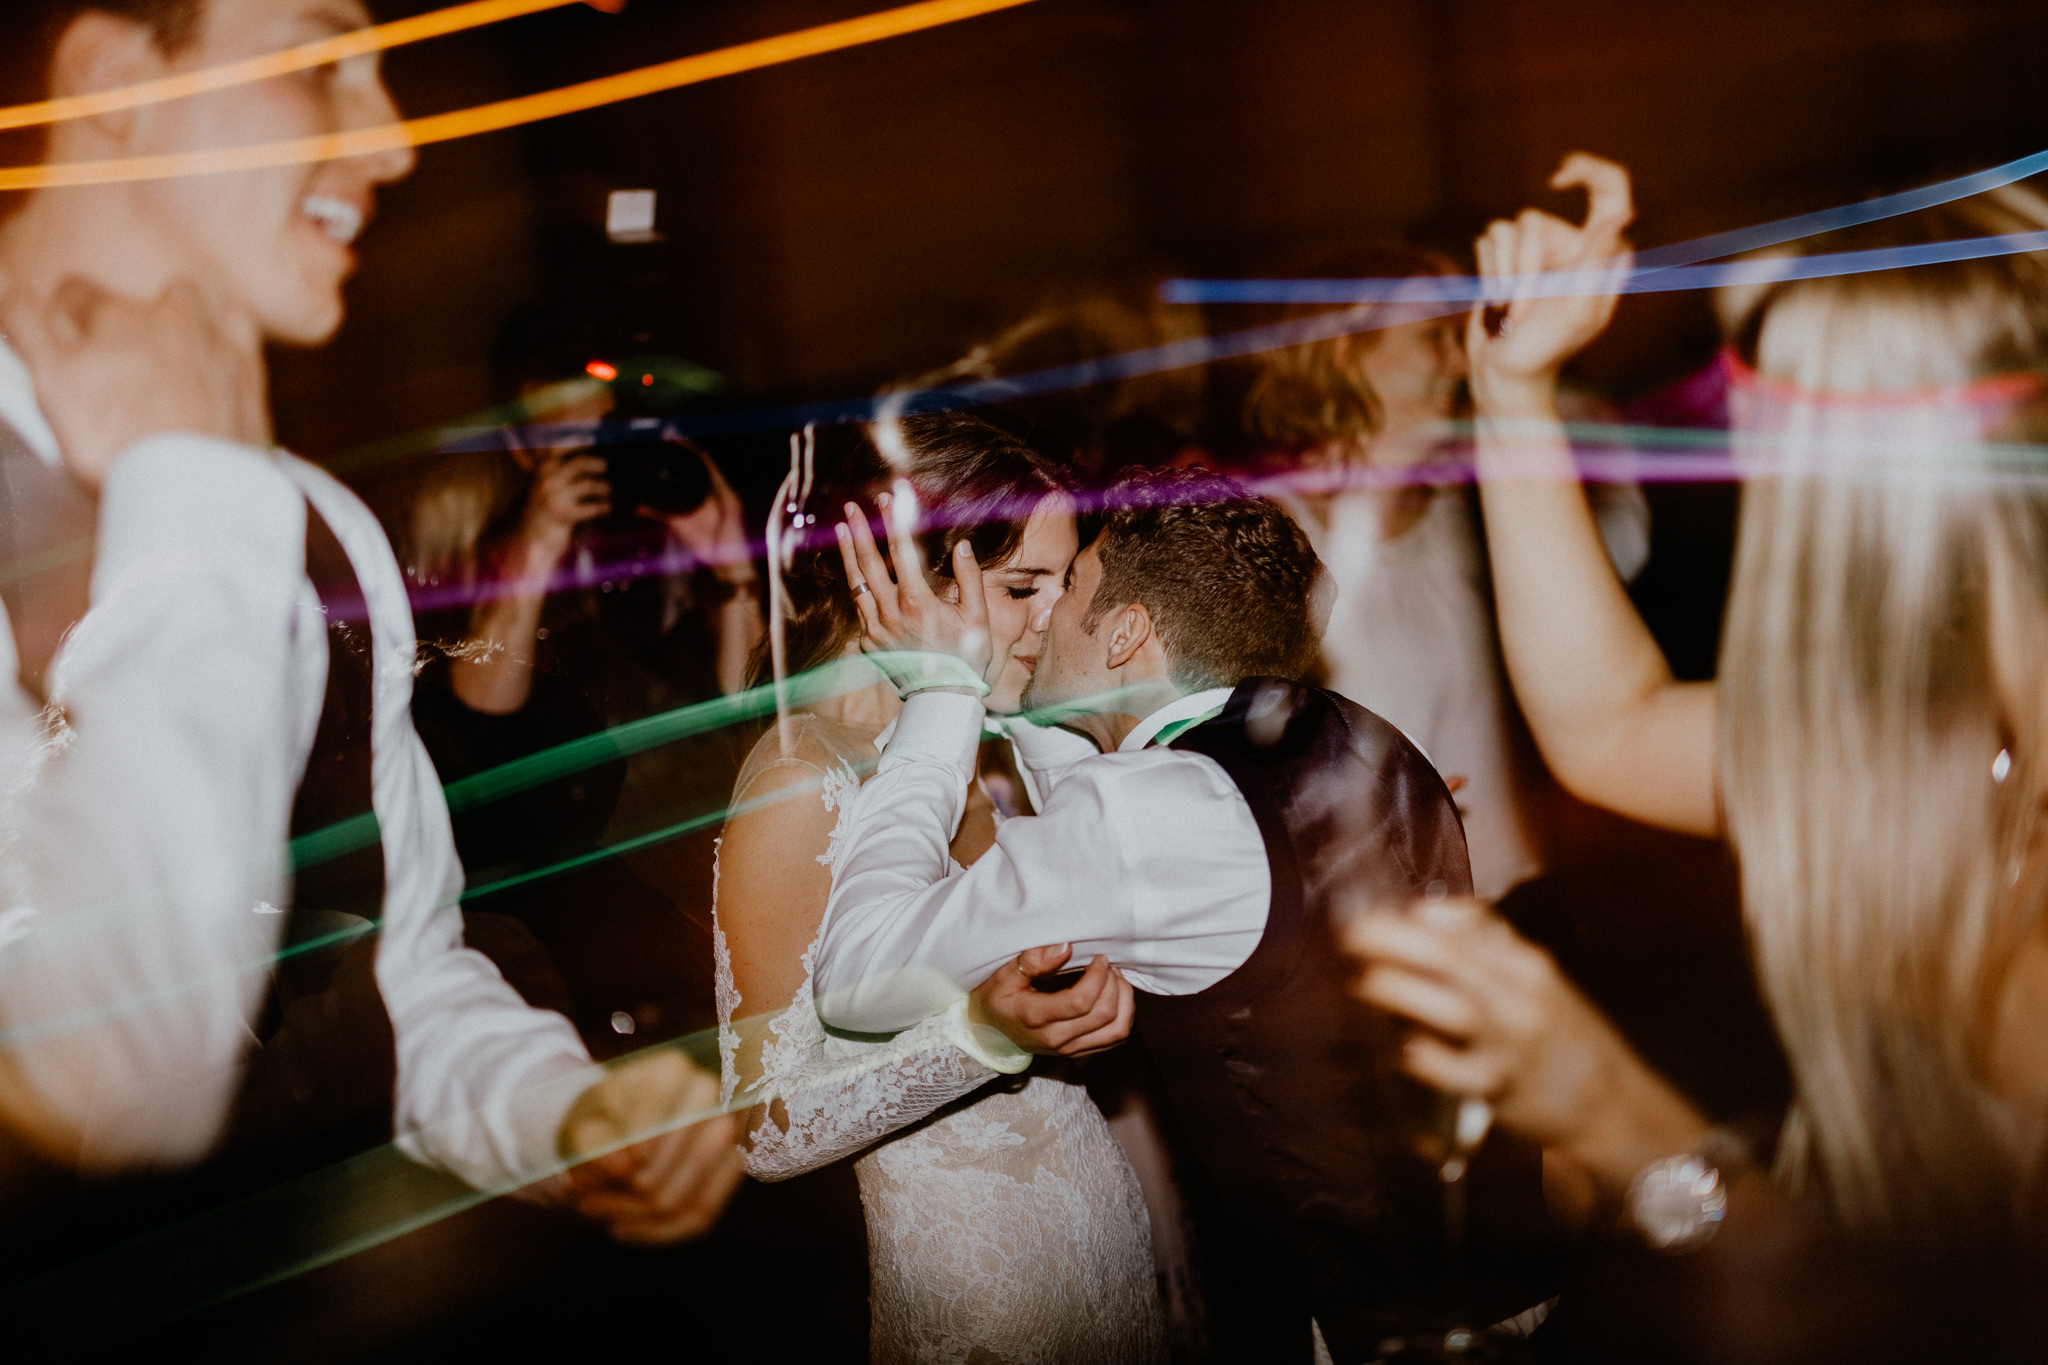 wedding-headlands-center-for-the-arts-sausalito-149.jpg